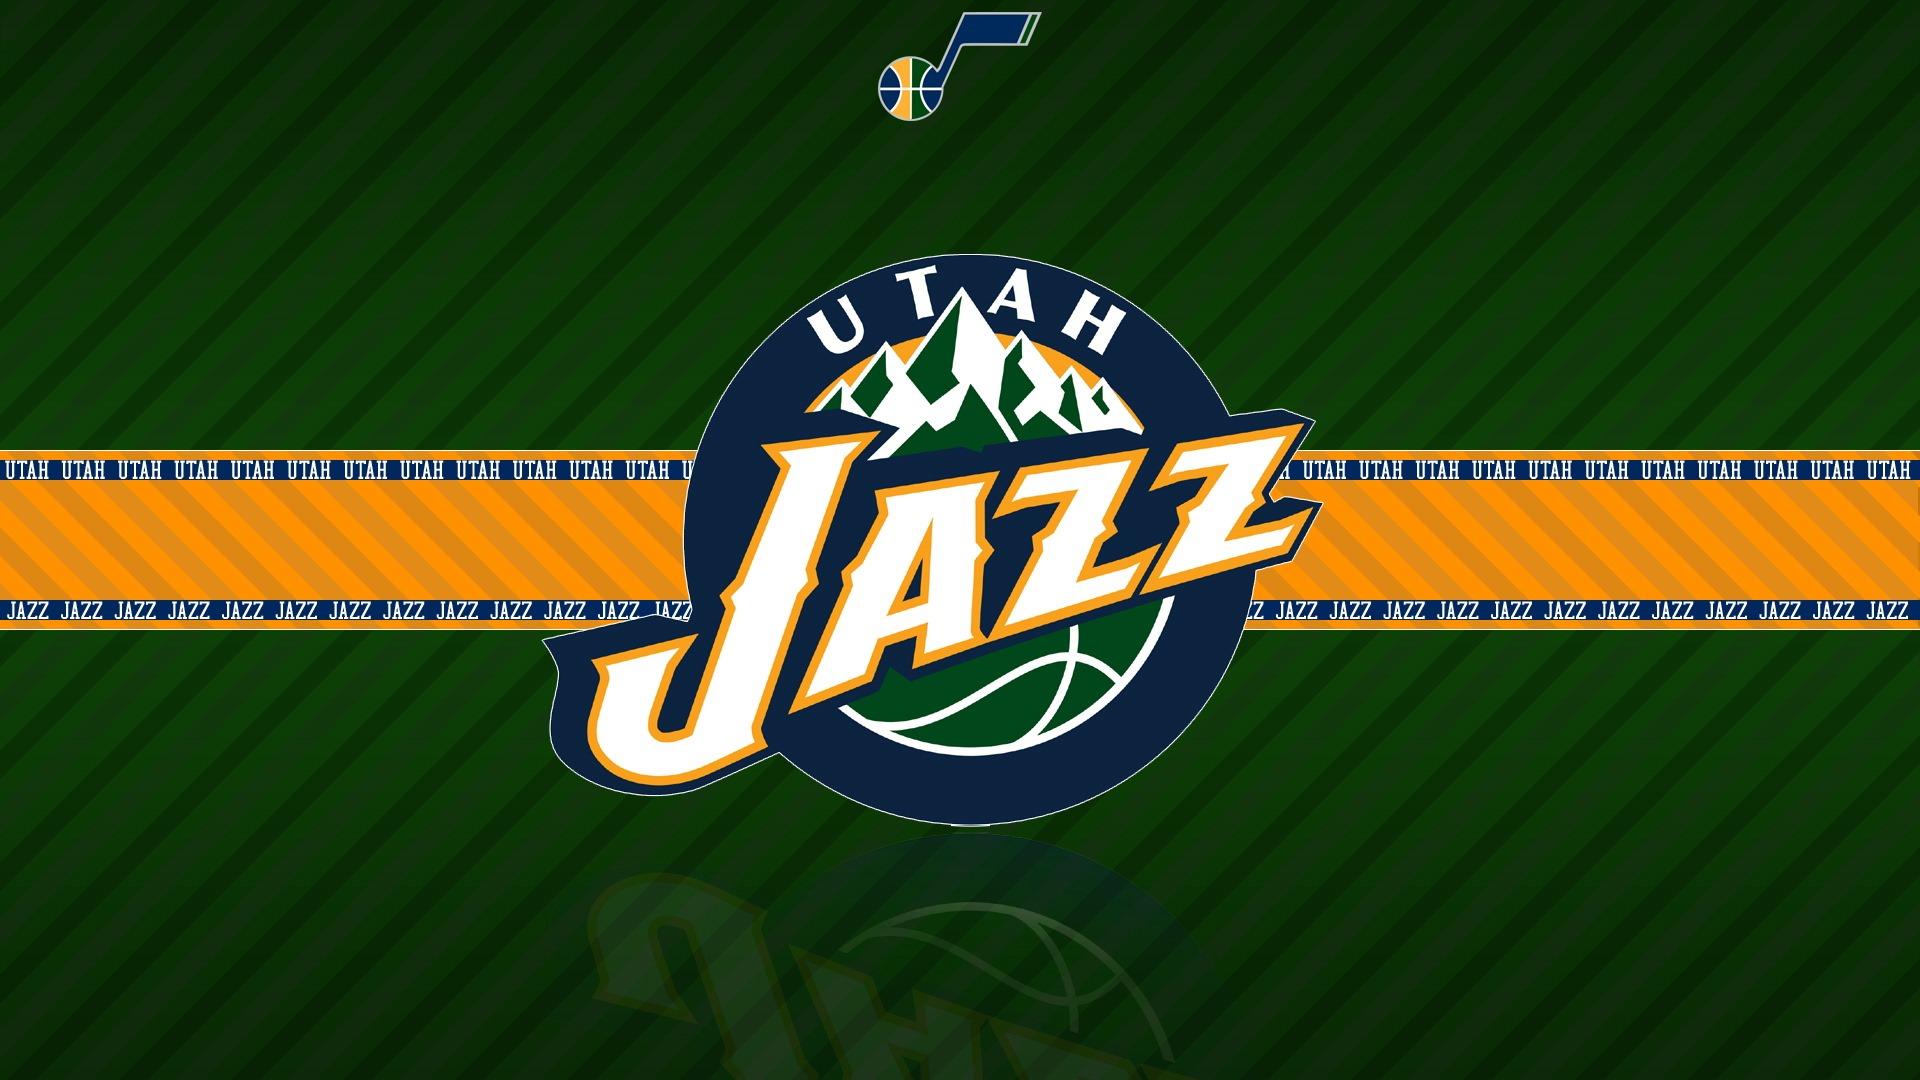 Amazing Utah Jazz Wallpapers - Utah Jazz Wallpaper 2020 - 19